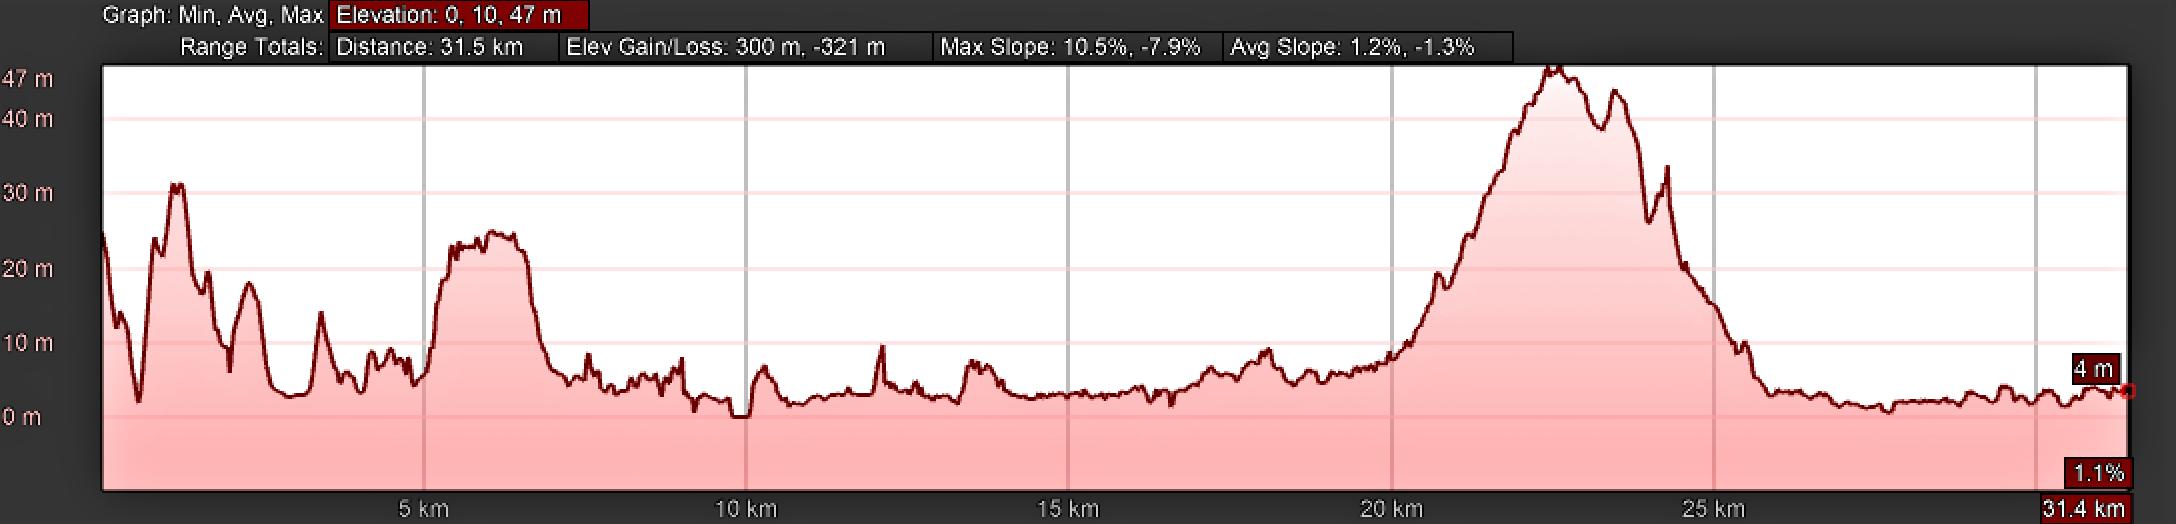 Elevation Profile, Day One, Camino Portugués, Lisbon Cathedral to Alverca do Ribatejo